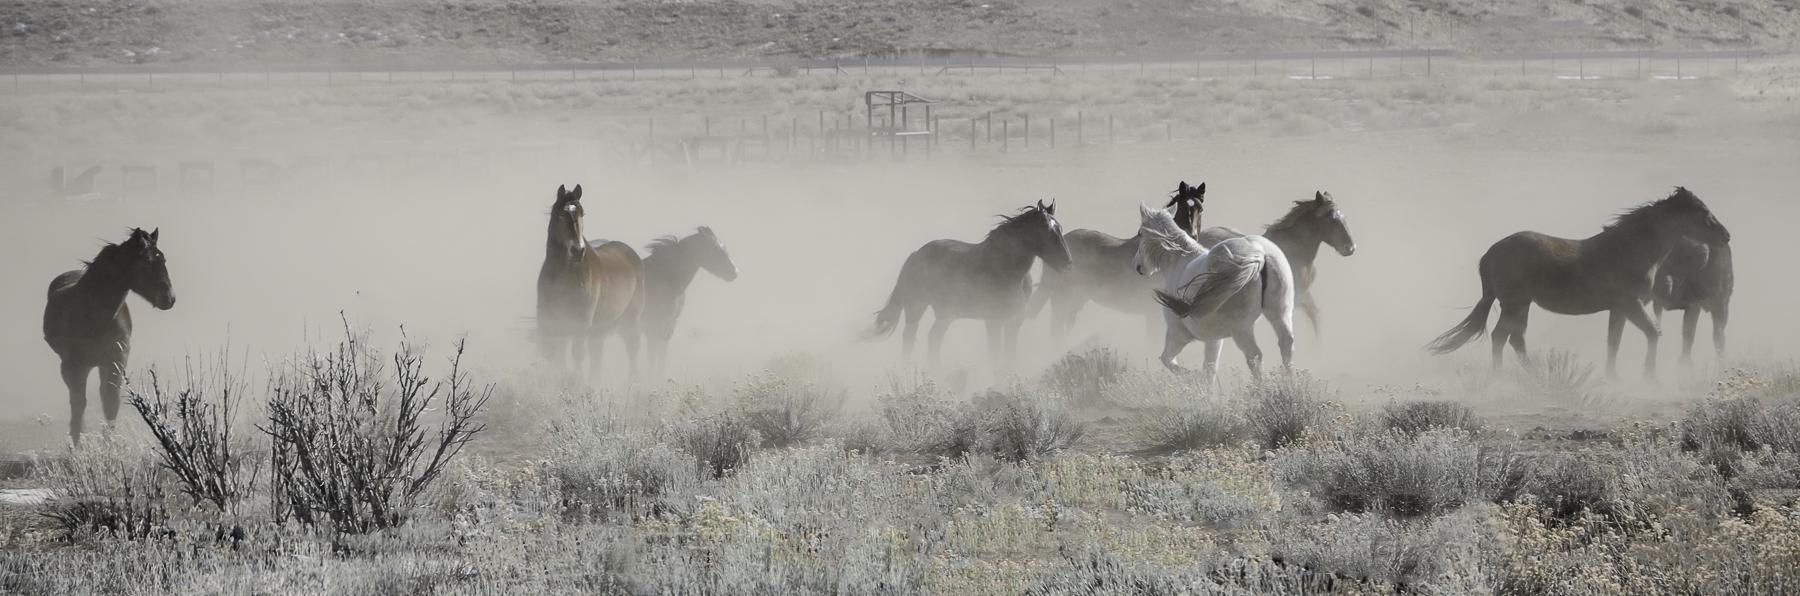 Sandra Lapham: Horses in a Storm